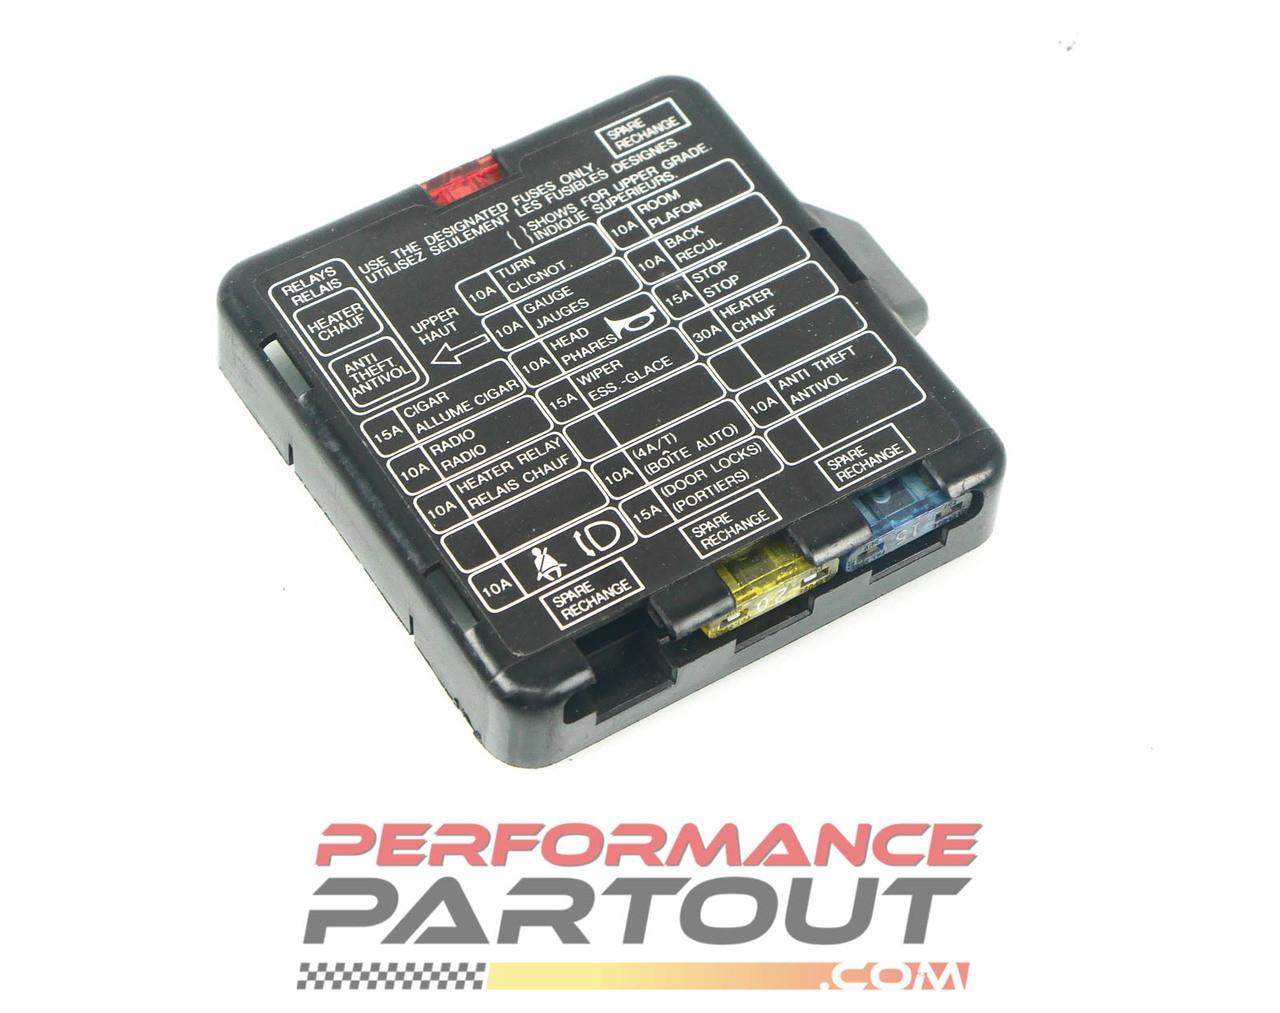 Fuse box cover interior 90-94 DSM - Performance Partout [ 1013 x 1280 Pixel ]